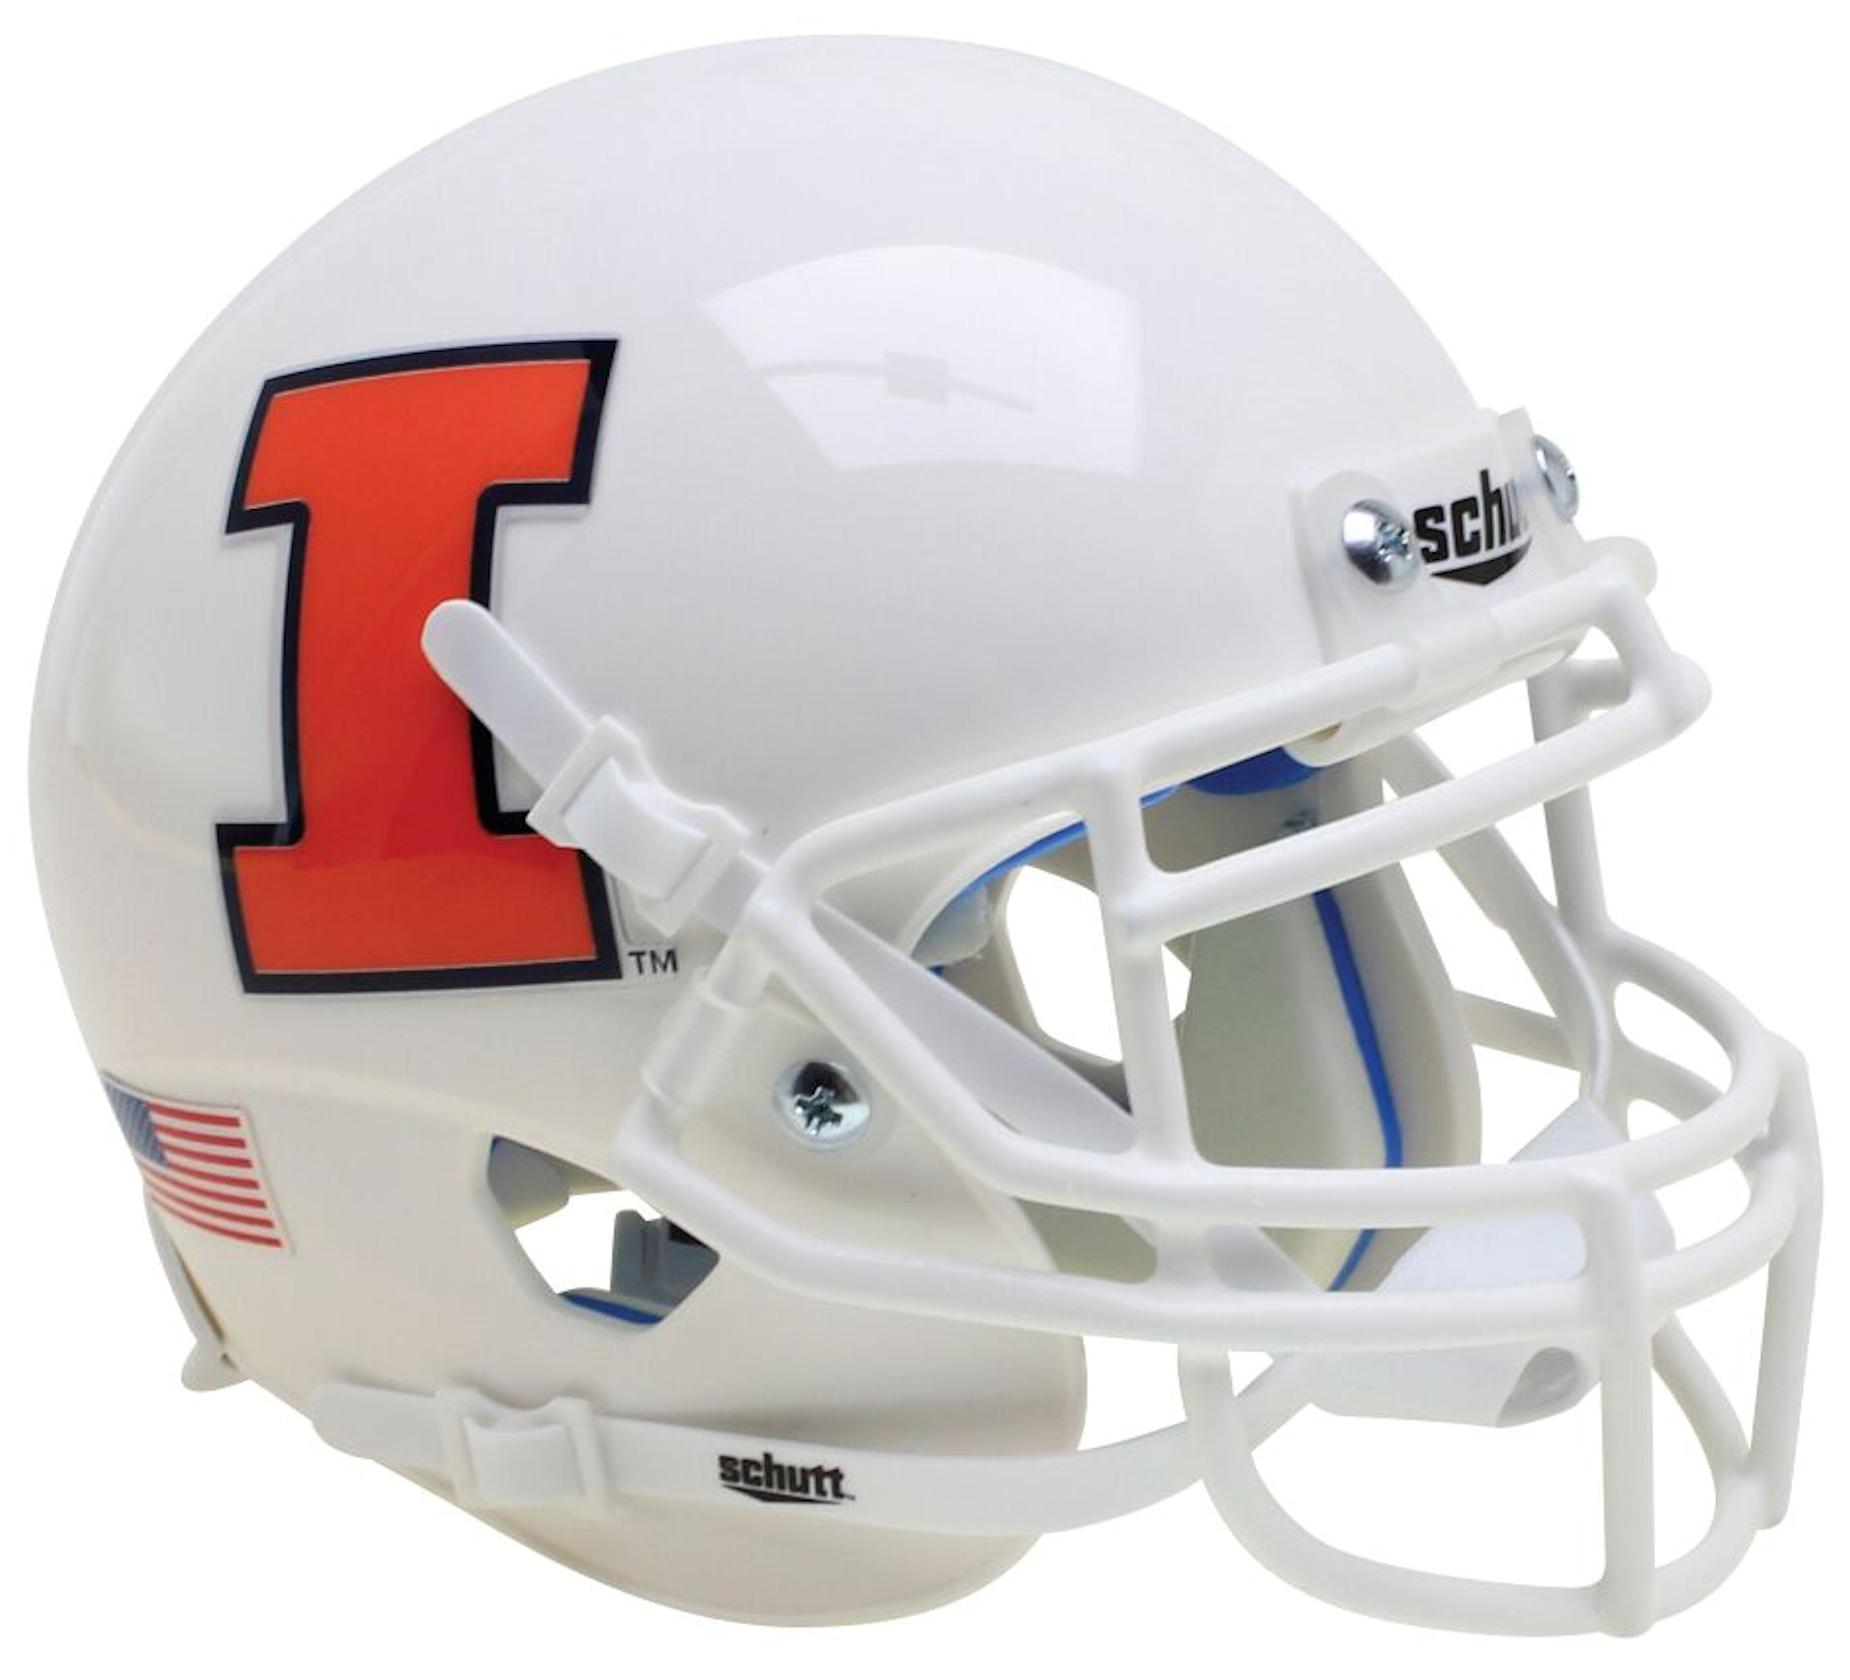 Illinois Fighting Illini Authentic College XP Football Helmet Schutt <B>White</B>